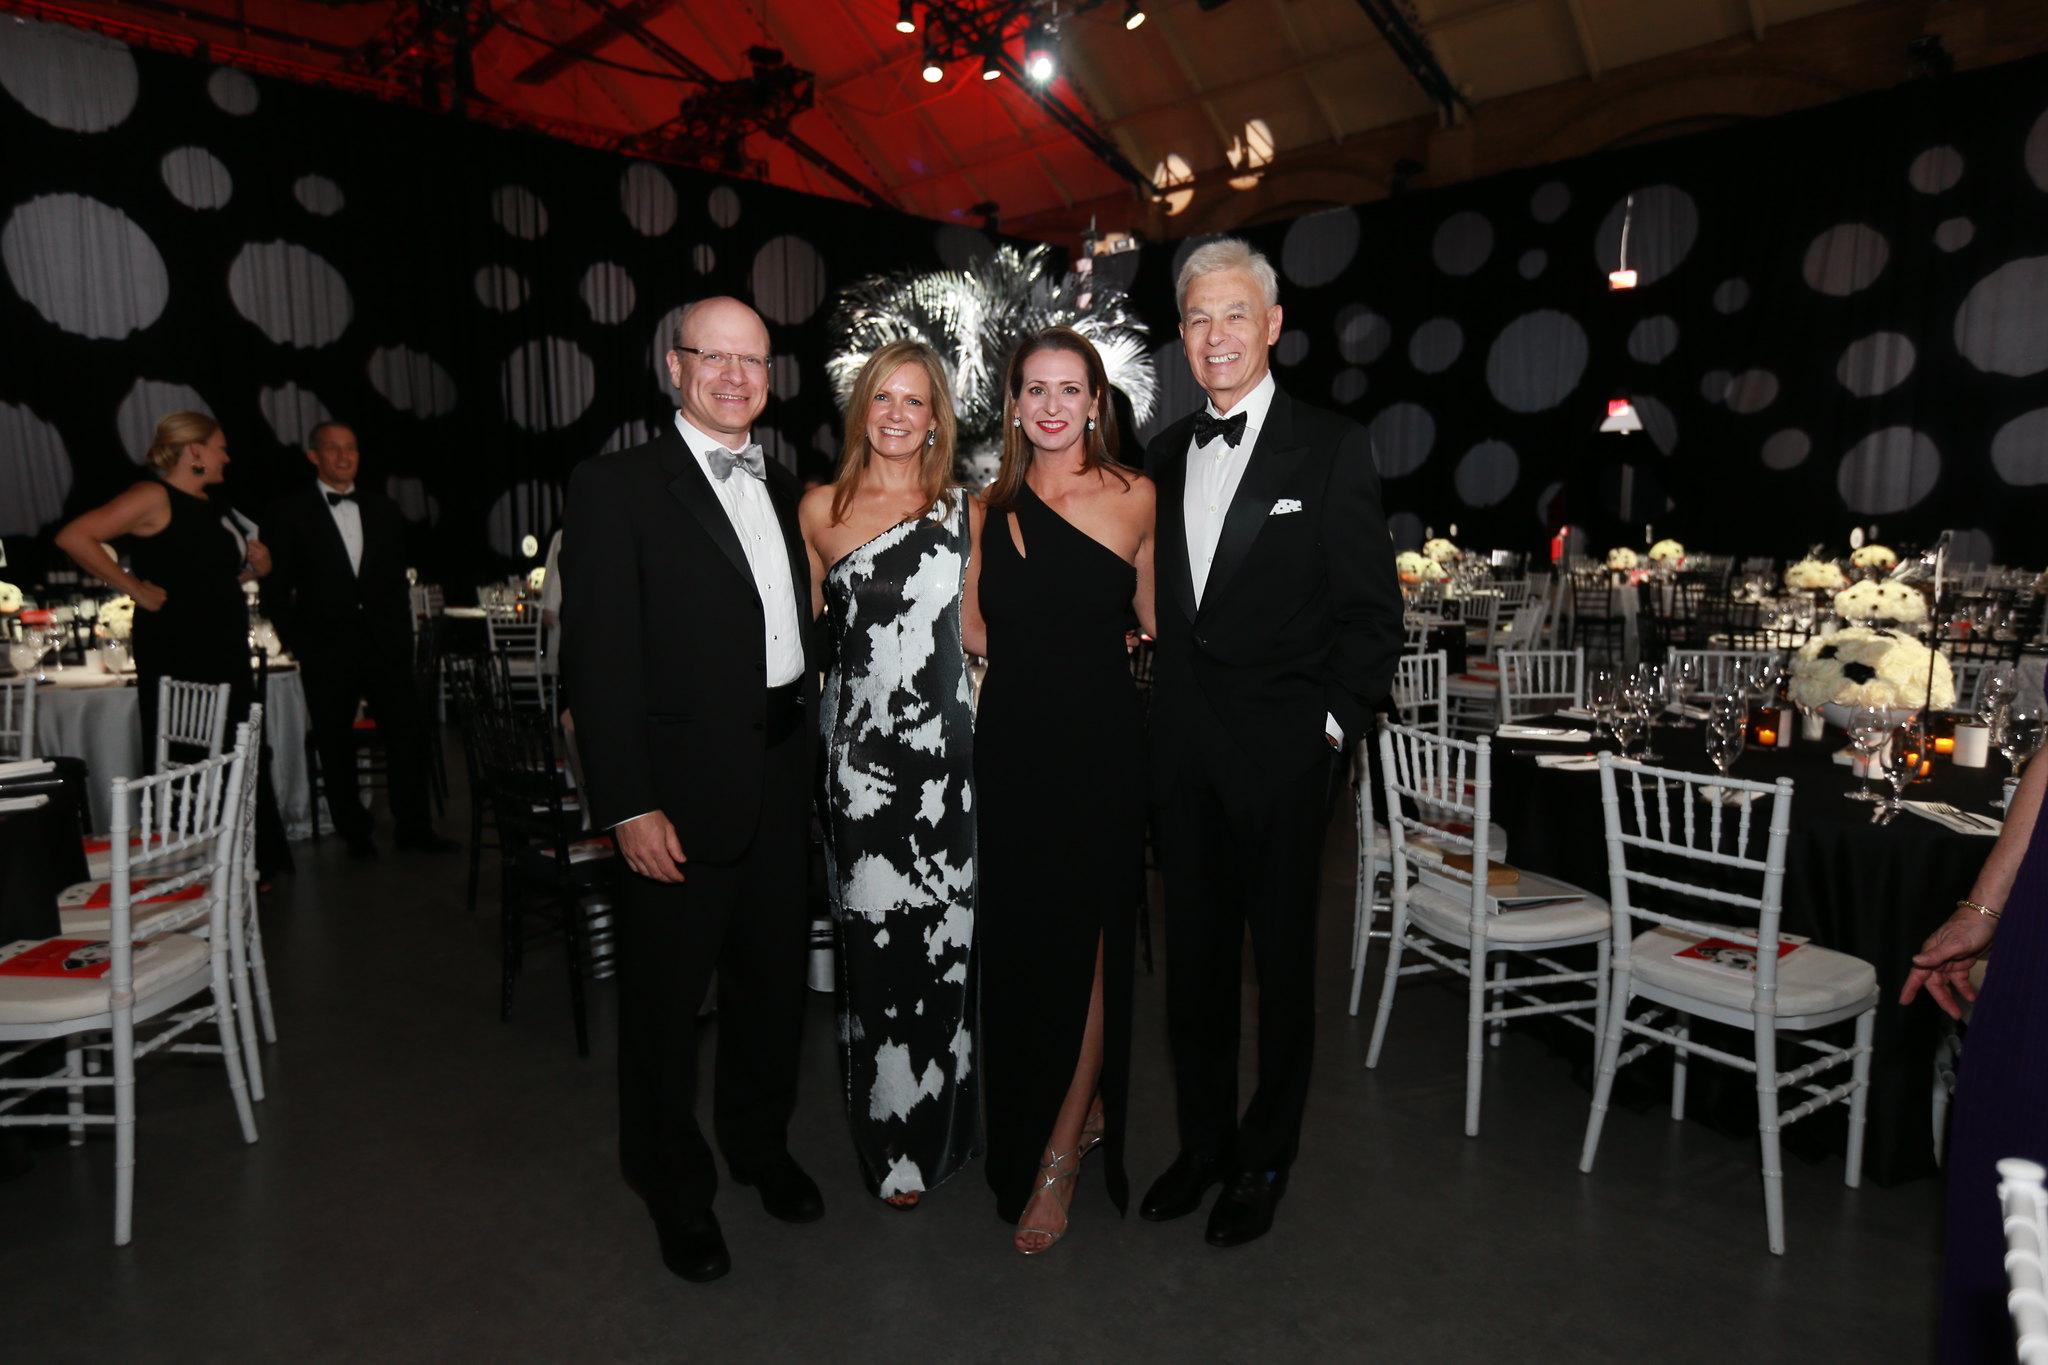 1 Storybook Ball 2018_Dr Allan Goldstein, Sonja Kelly, Jennifer Dolins, Dr Ronald Kleinman_W2ST9538